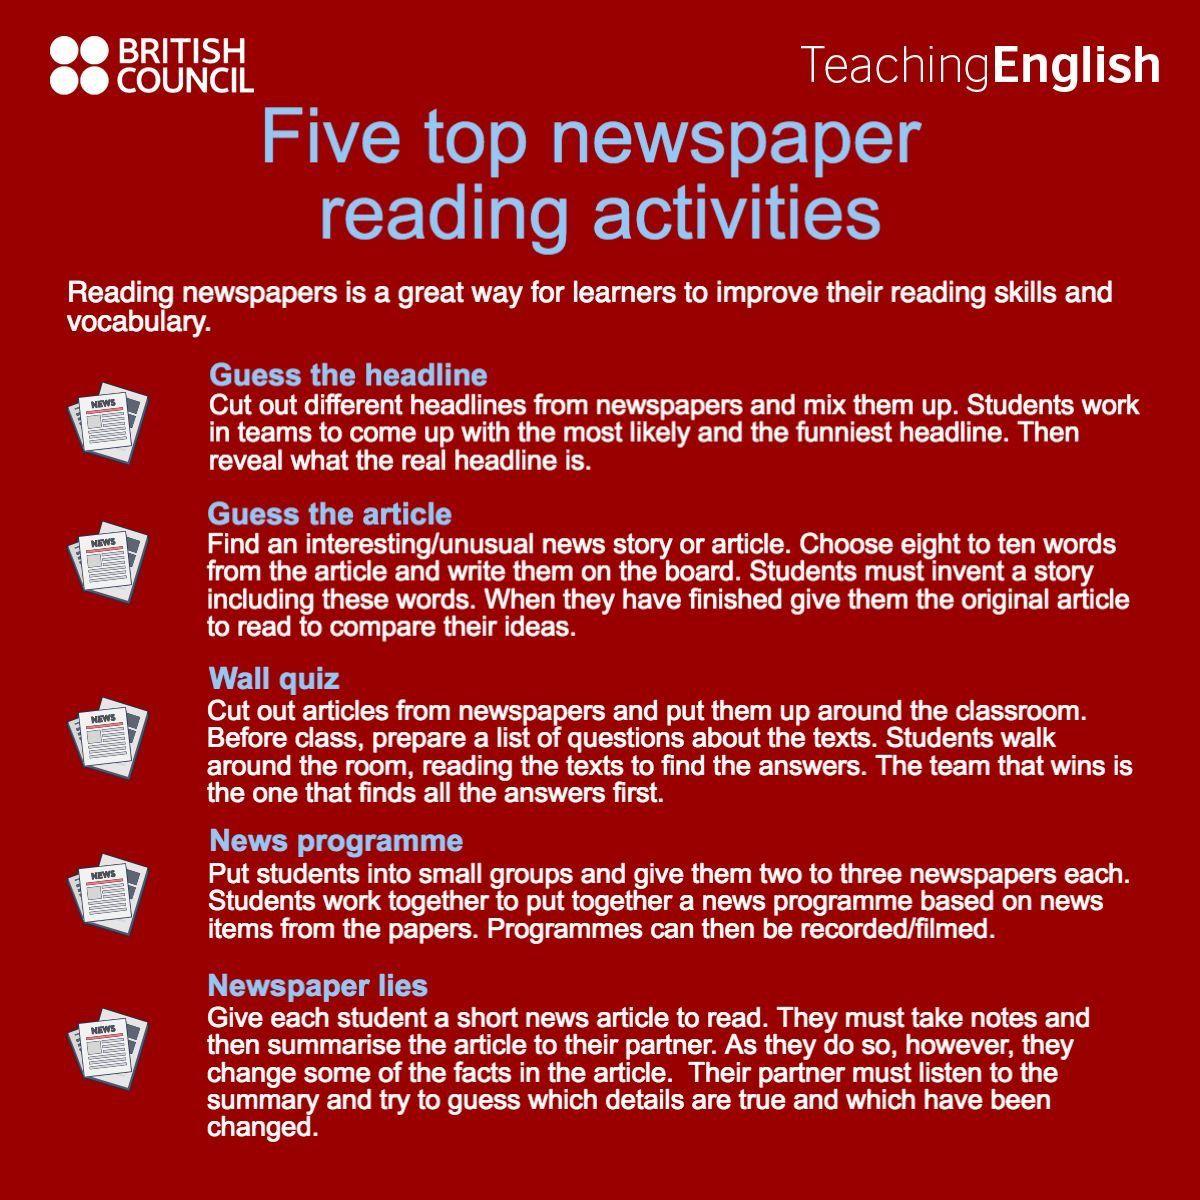 Newspaper Reading Activities Improve Reading Skills Reading Activities Reading Vocabulary How to improve english reading